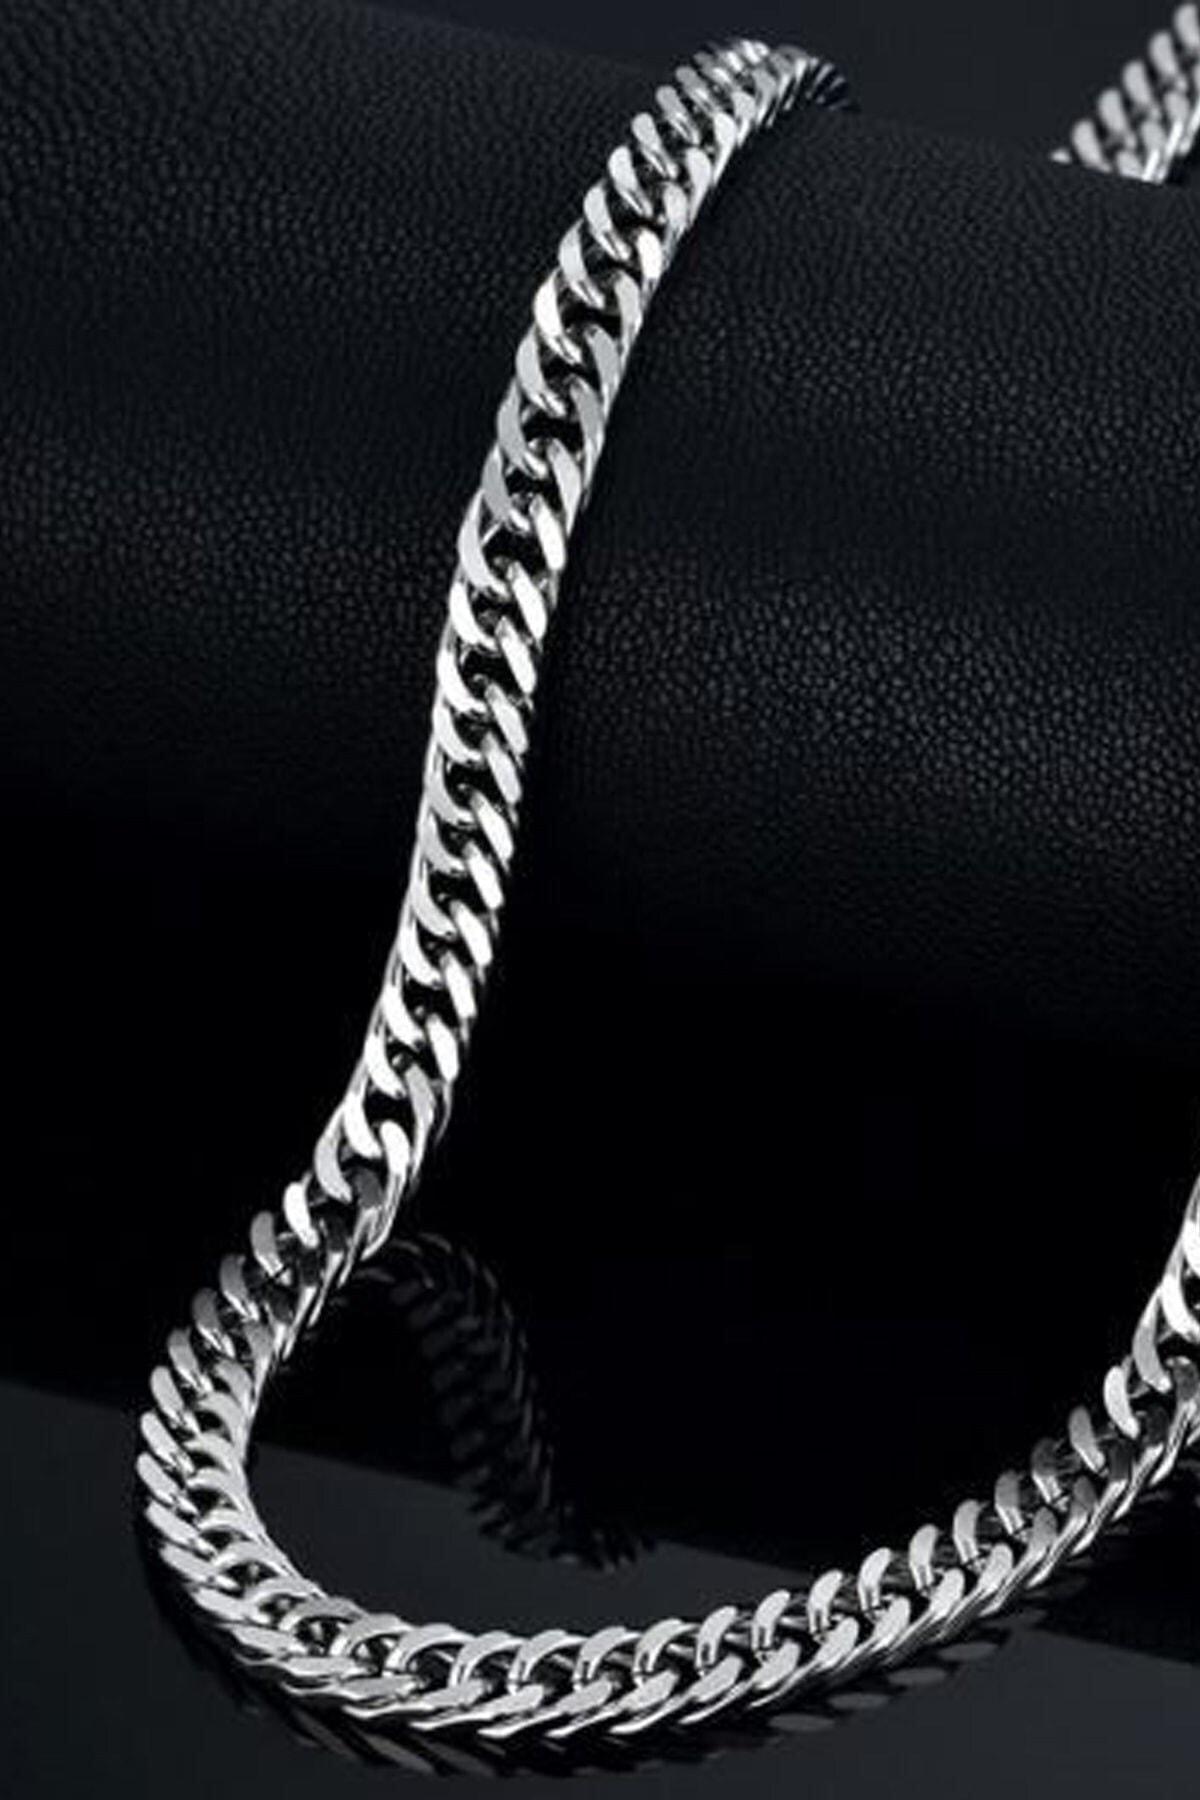 X-Lady Accessories Kalın 6mm Sık Aralıklı Yassı Zincir 1